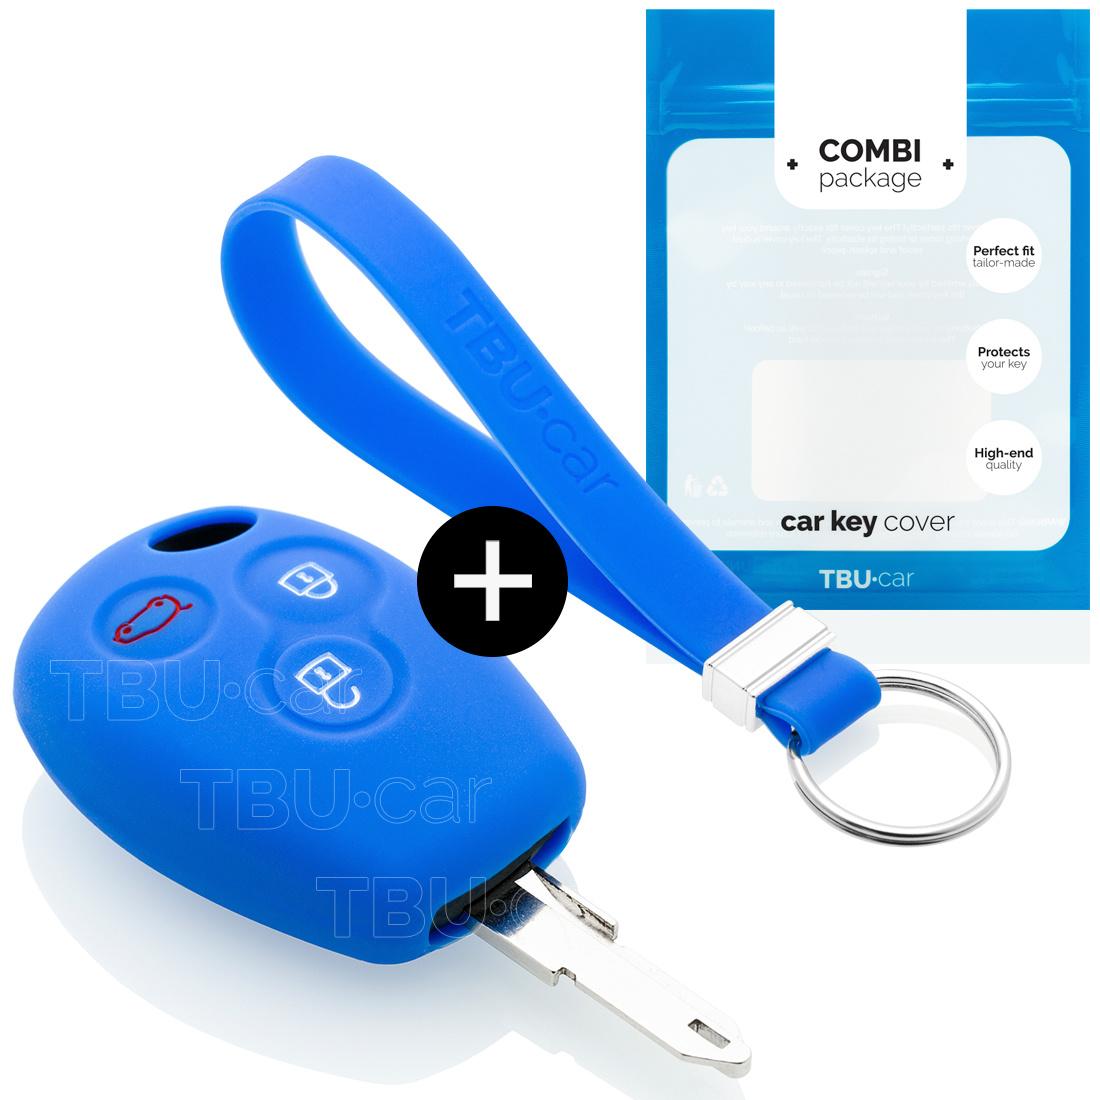 TBU car TBU car Autoschlüssel Hülle kompatibel mit Smart 3 Tasten - Schutzhülle aus Silikon - Auto Schlüsselhülle Cover in Blau